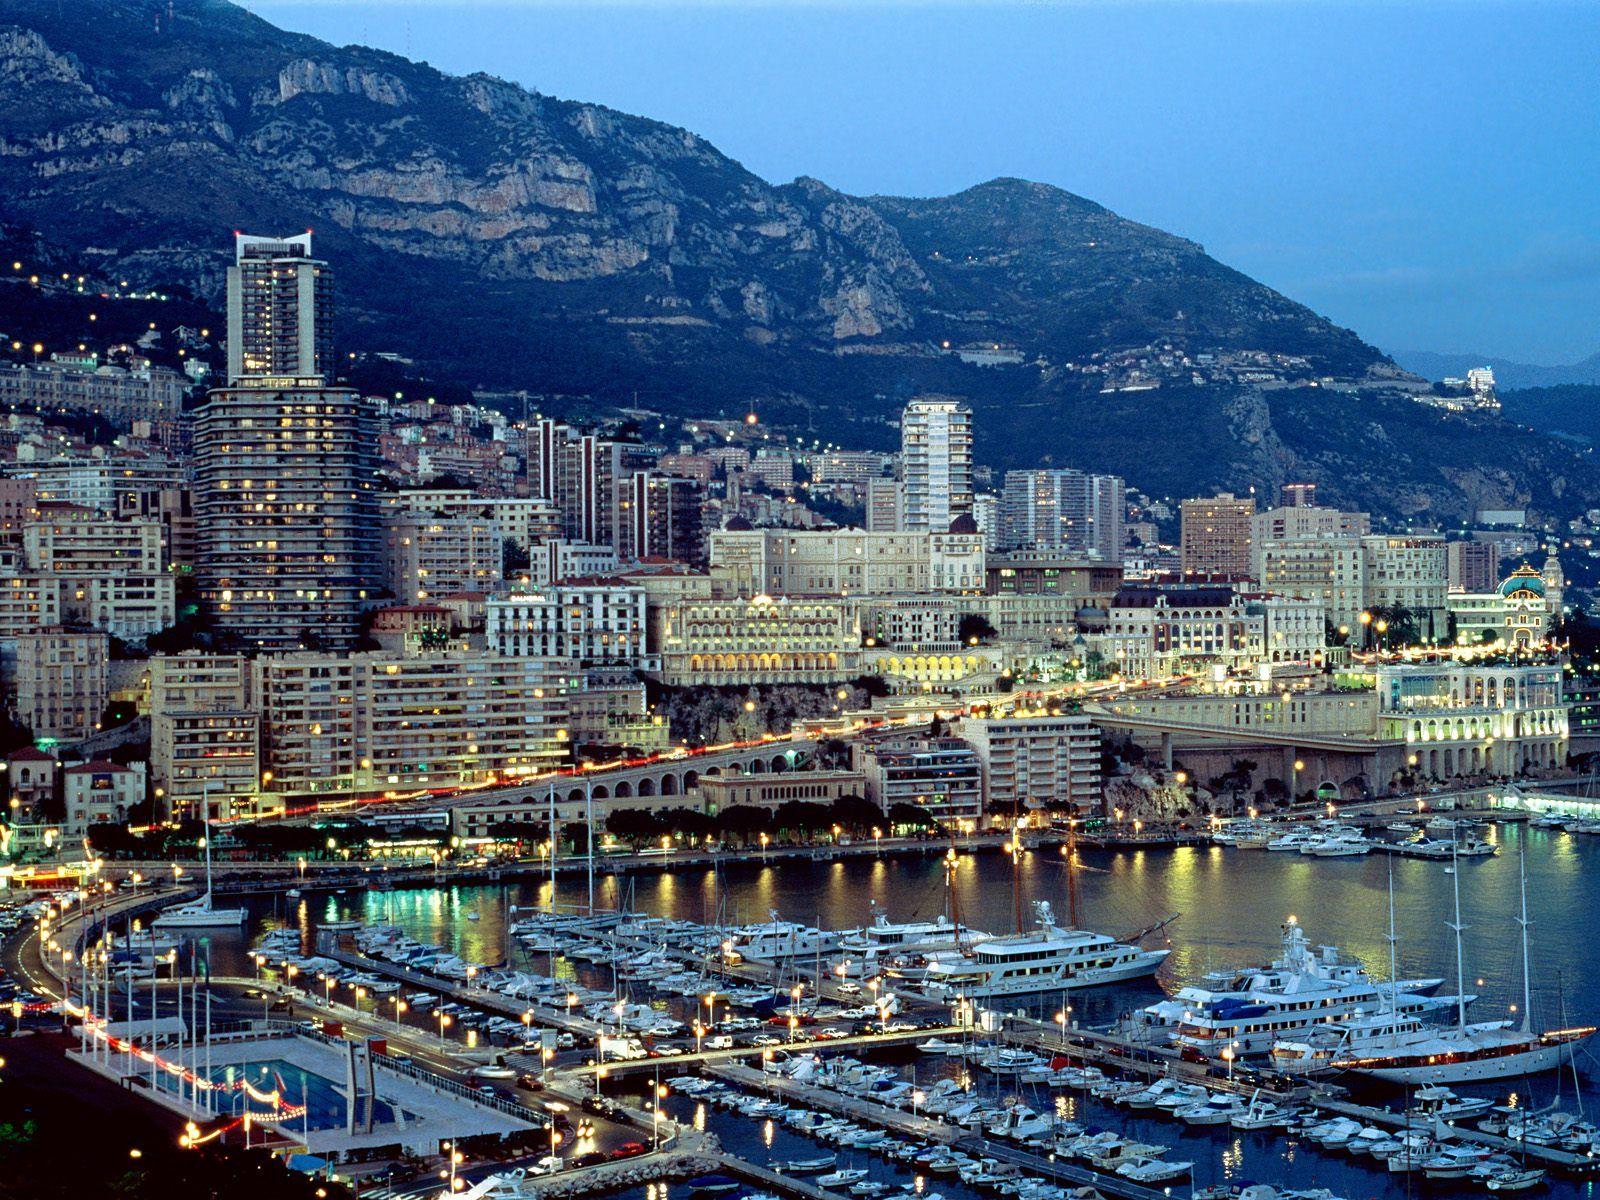 Endless Nights Monte Carlo Monaco Pictures Pics Photos Romantic Places Places To Go Most Romantic Places Amazing monte carlo wallpapers